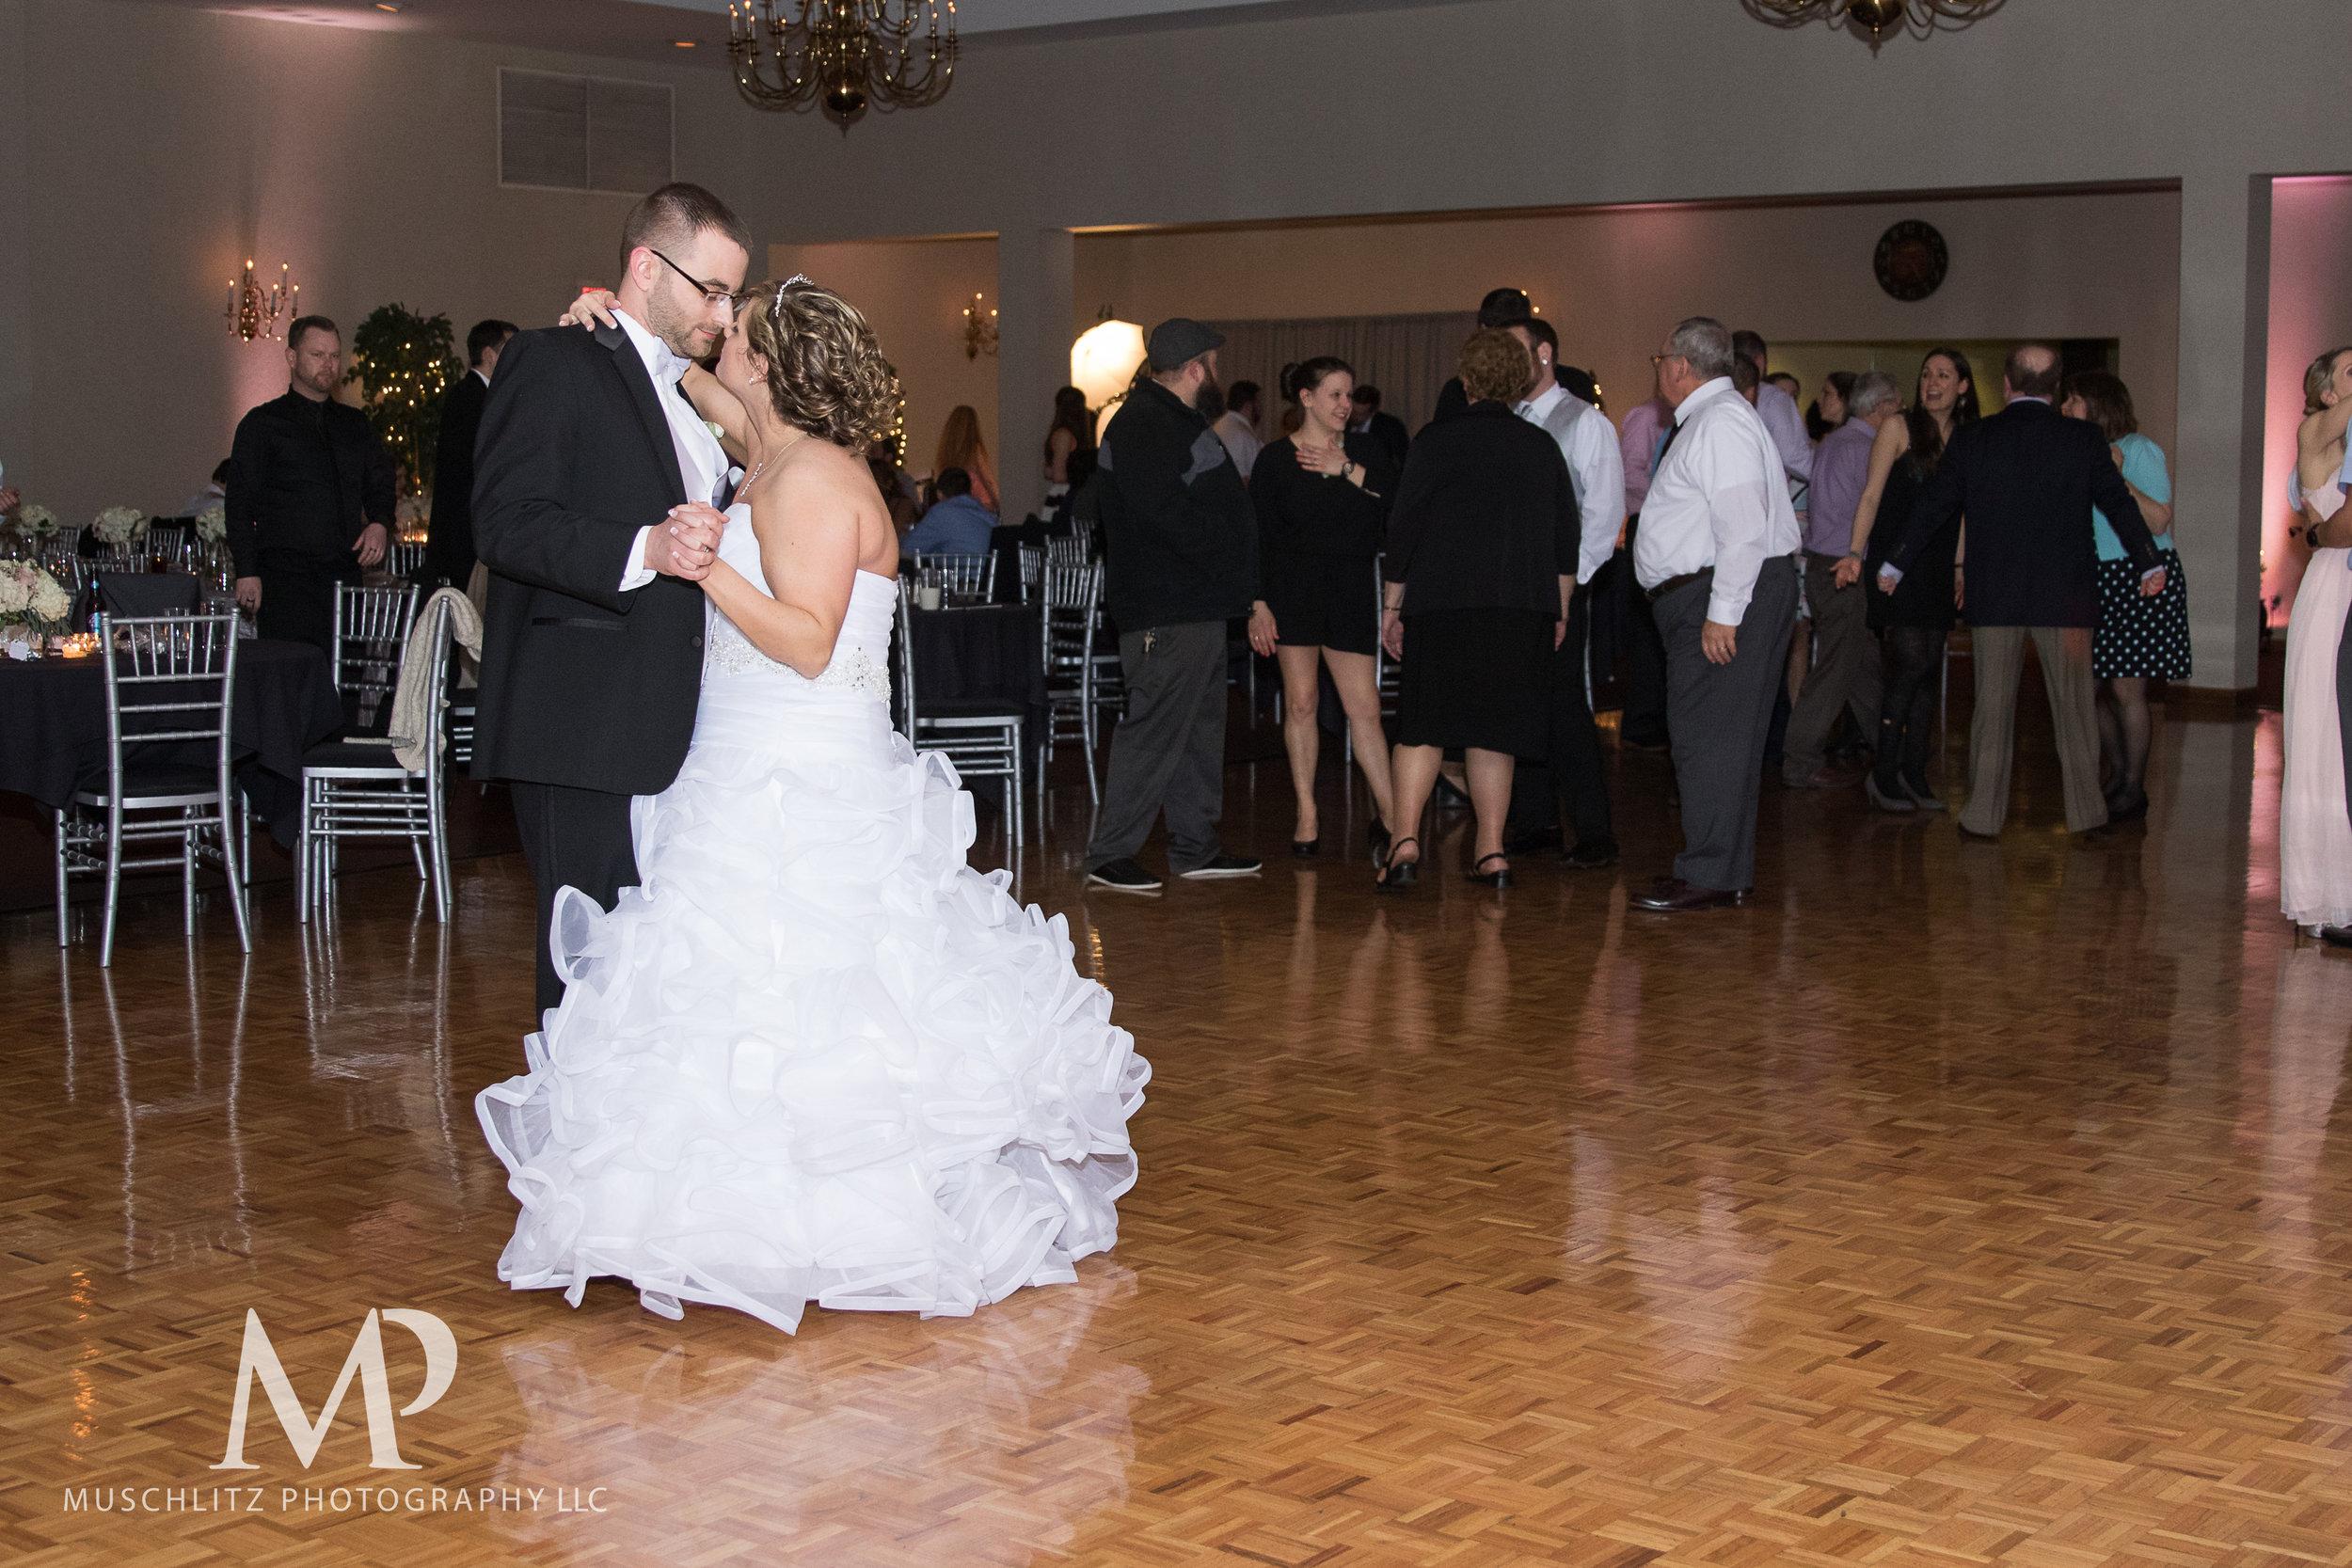 annunciation-banquet-conference-center-downtown-columbus-wedding-reception-downtown-columbus-ohio-muschlitz-photography-034.JPG